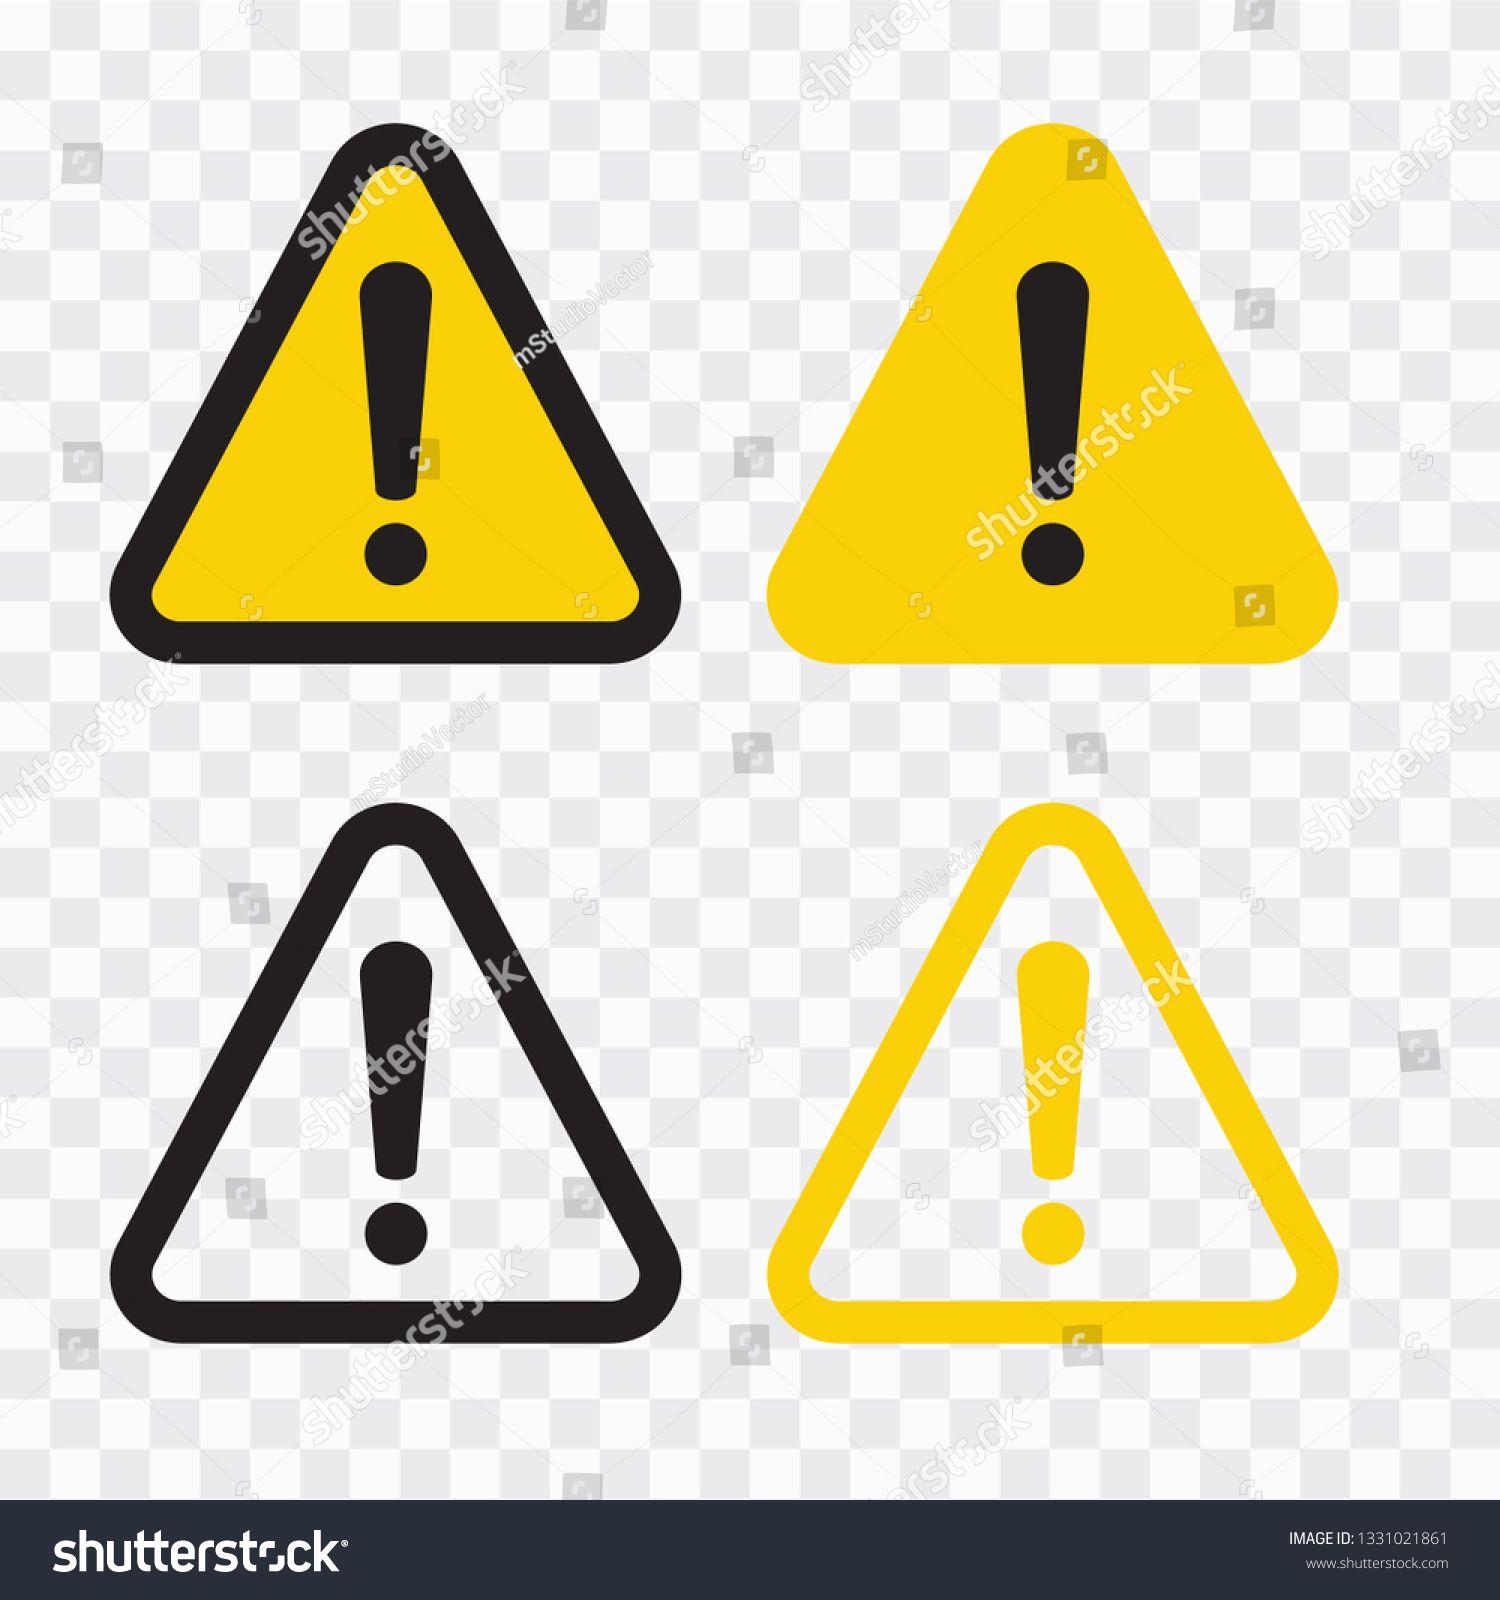 Warning attention sign. Danger sign design. Caution error